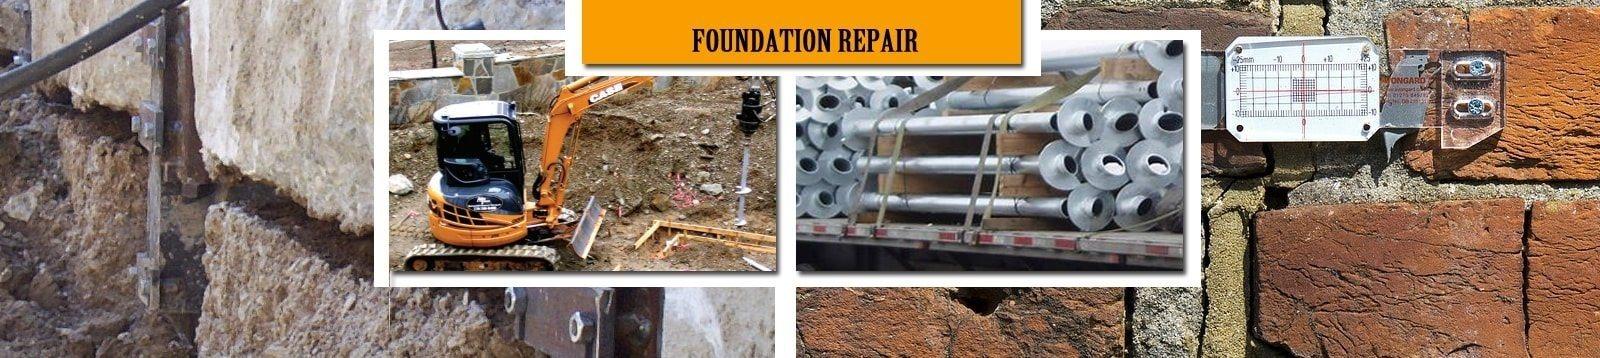 foundation repair services in Eastern Nebraska and Western Iowa